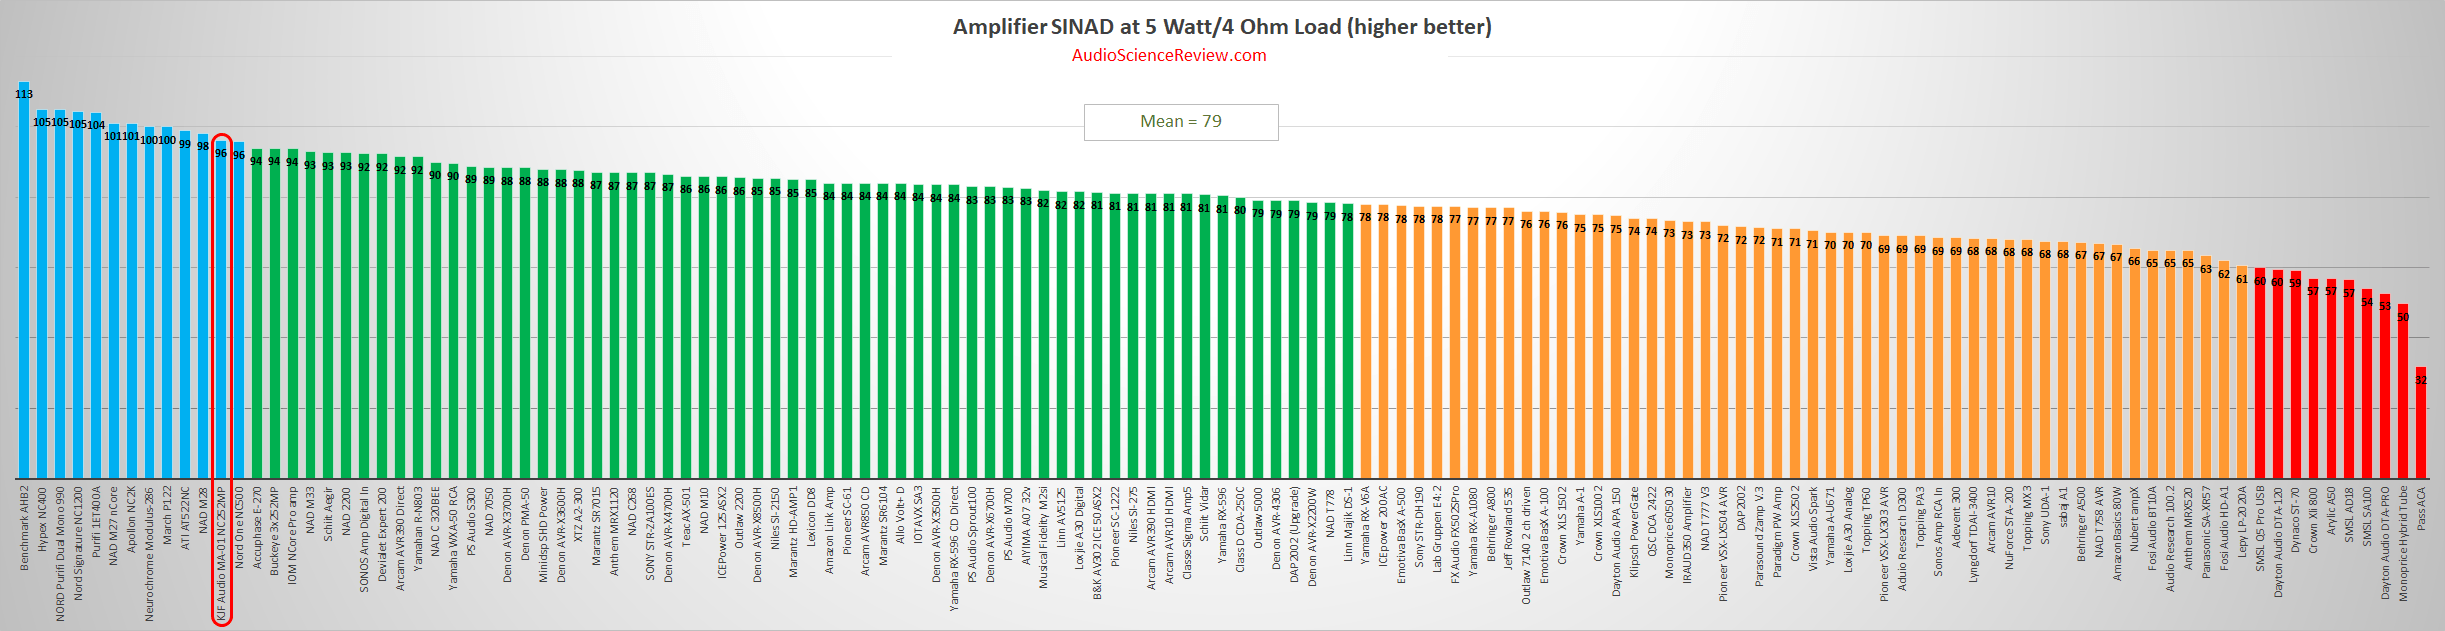 Best multichannel amplifier review 2021.png